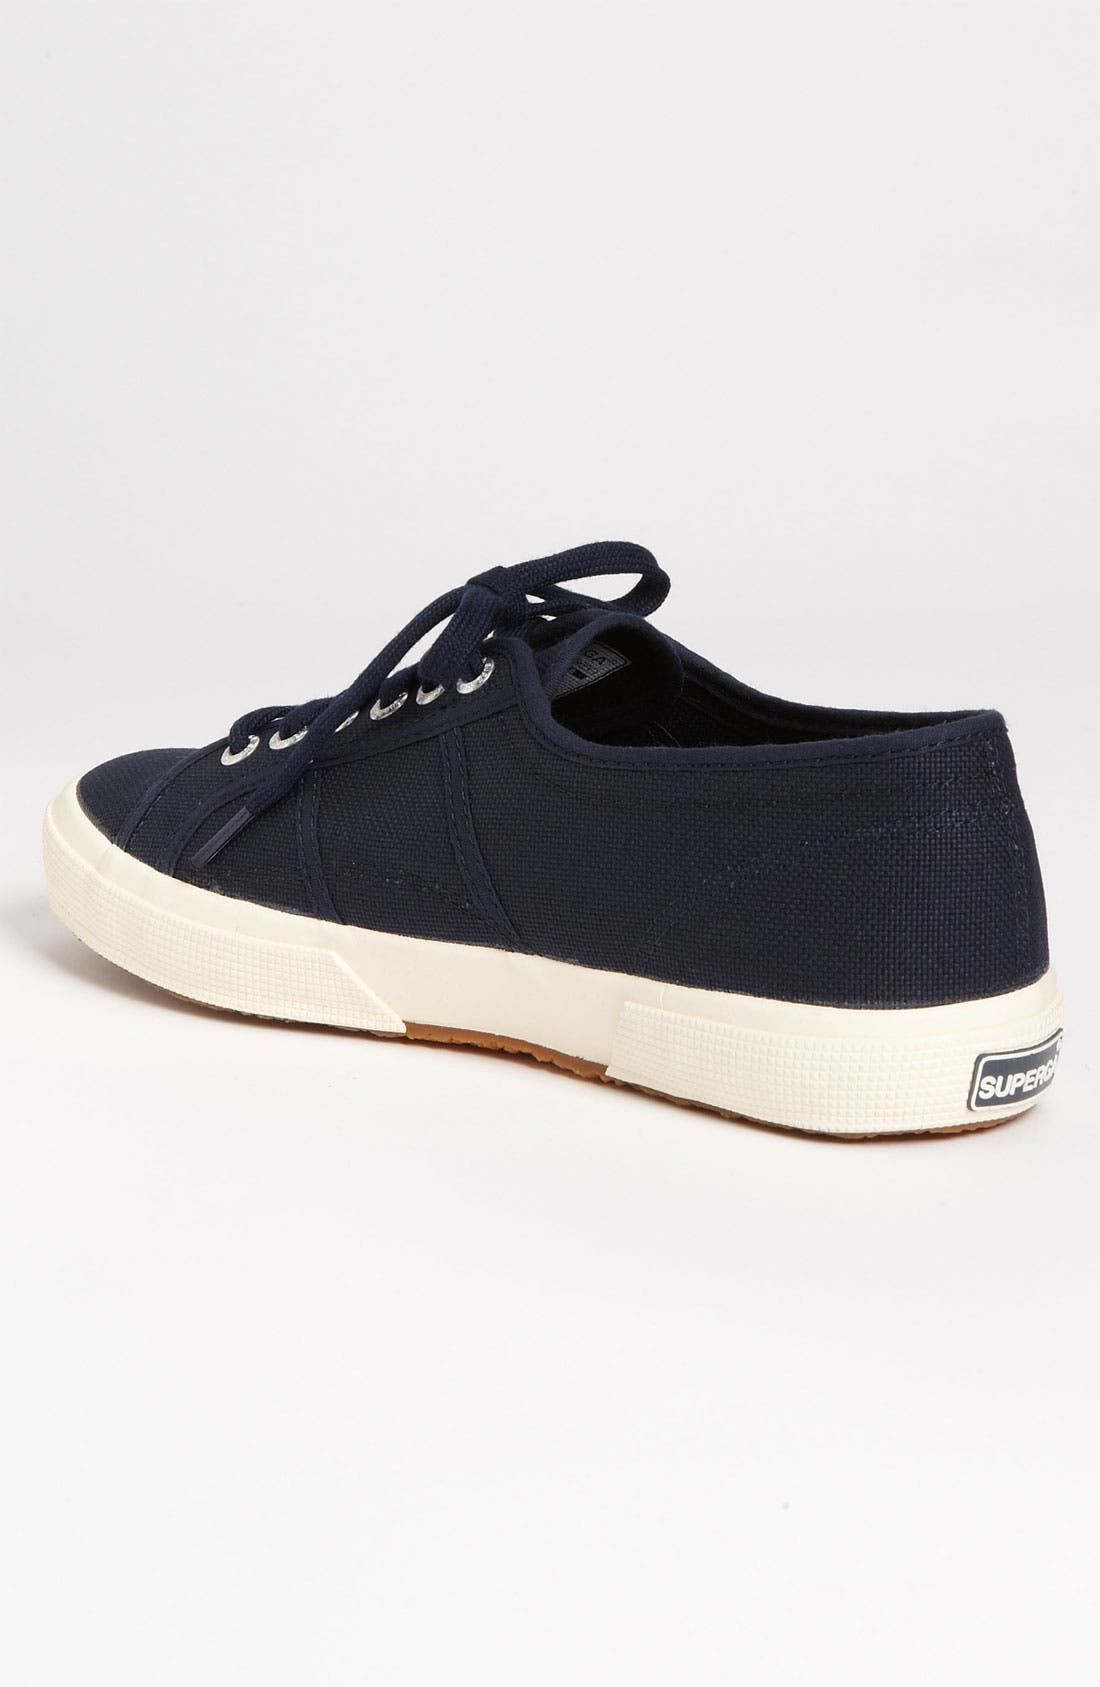 Alternate Image 2  - Superga 'Cotu' Sneaker (Men)